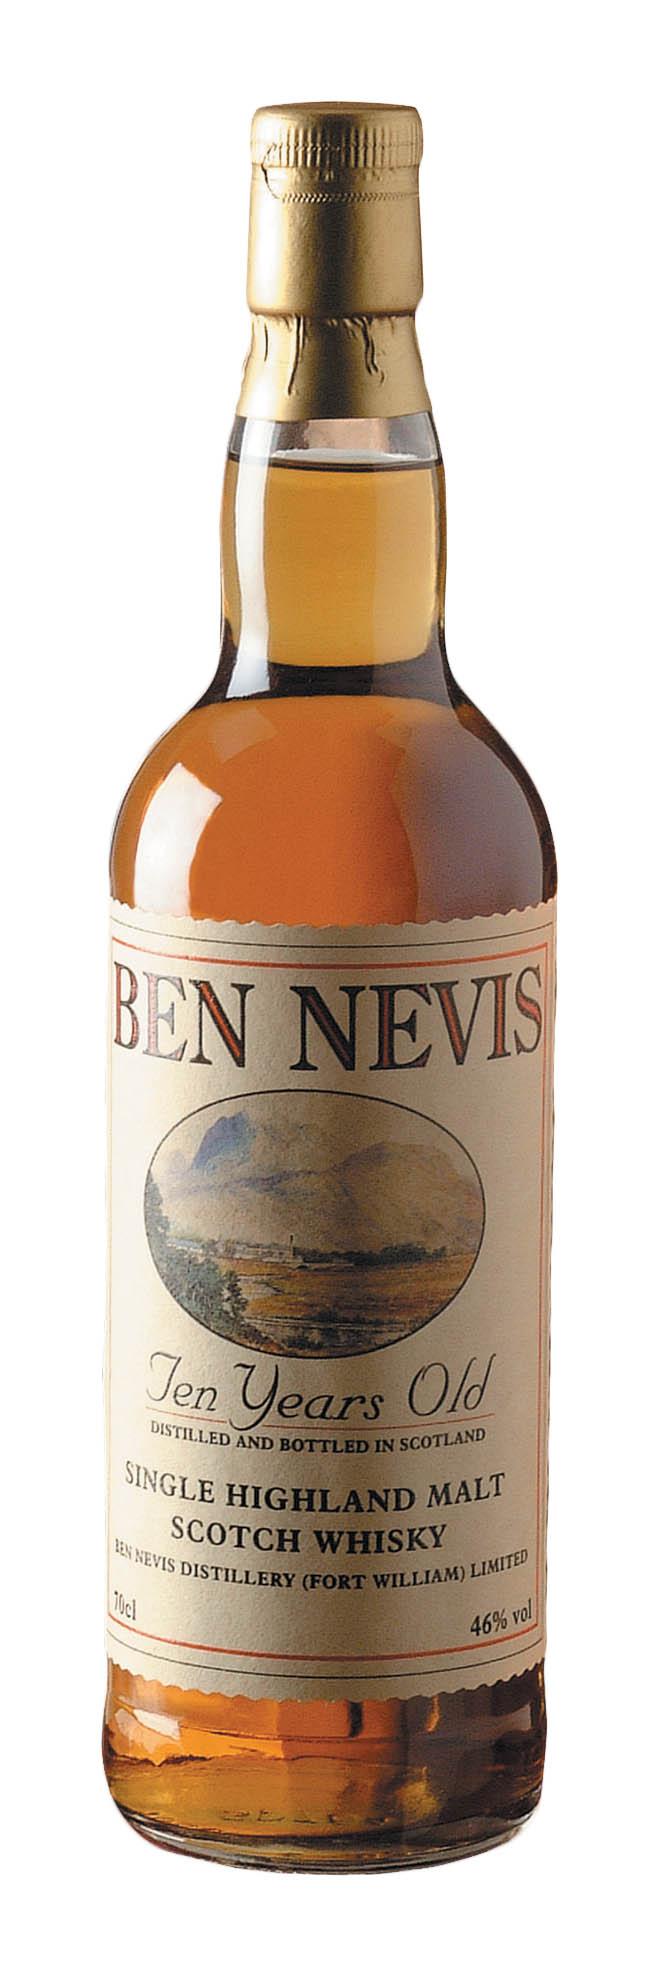 Ben Nevis<br>10 Years Old